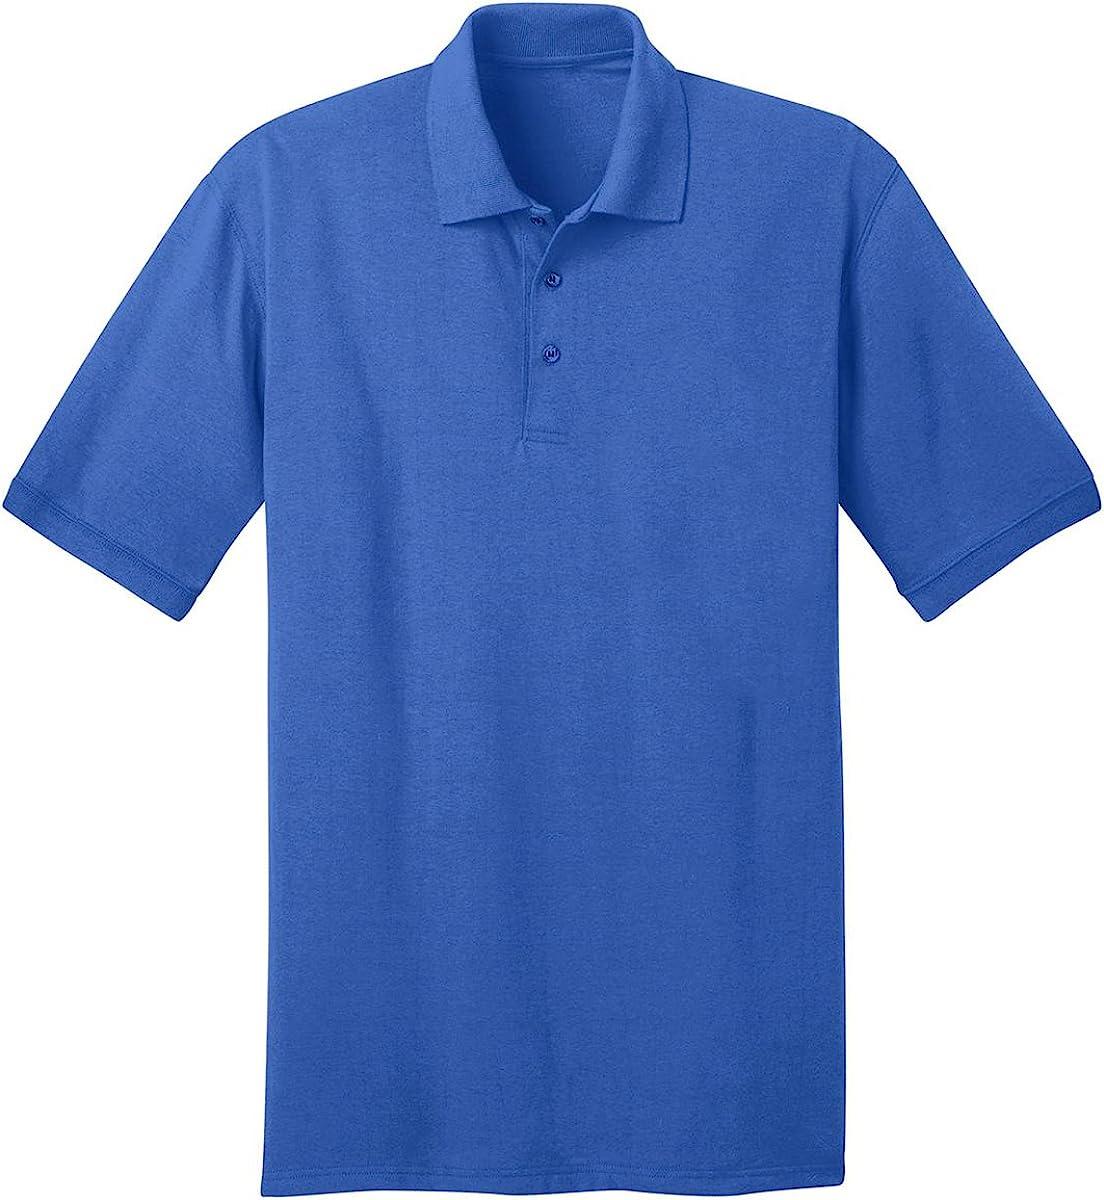 Port & Company Tall 5.5 oz Jersey Knit Polo Shirt-3XLT (Royal)